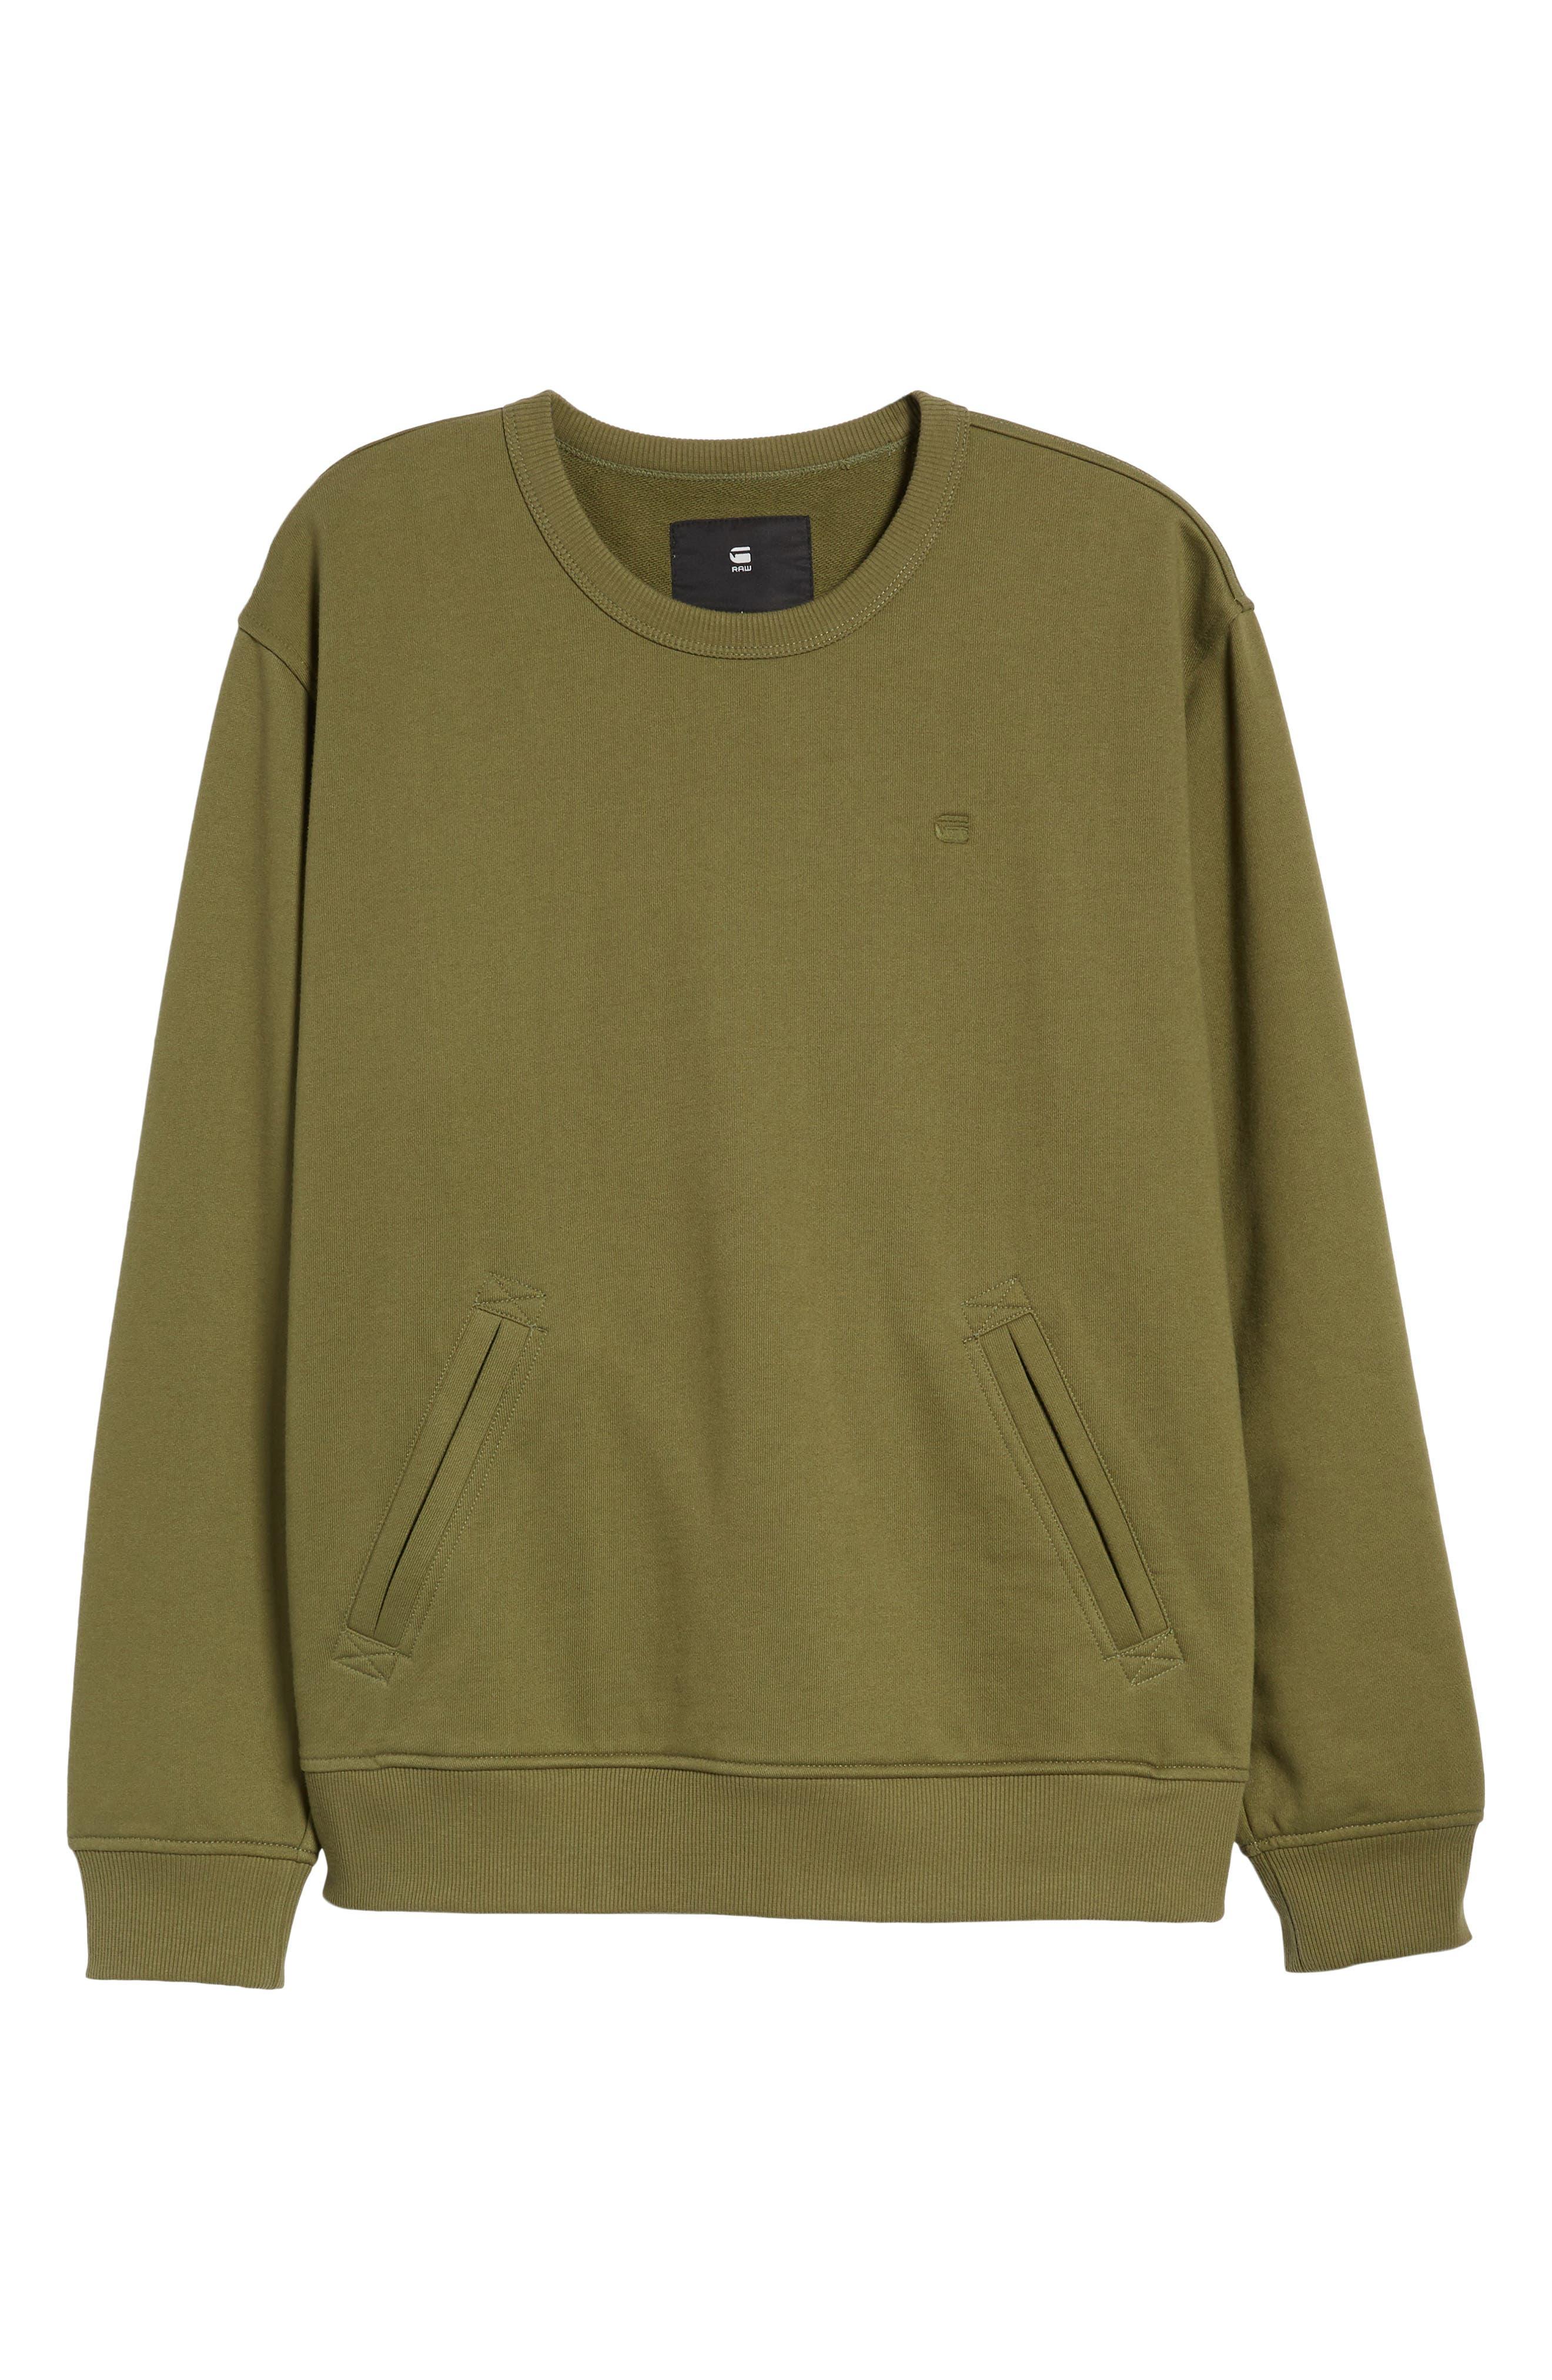 G-STAR RAW,                             Core Hybrid Archive Sweatshirt,                             Alternate thumbnail 6, color,                             300